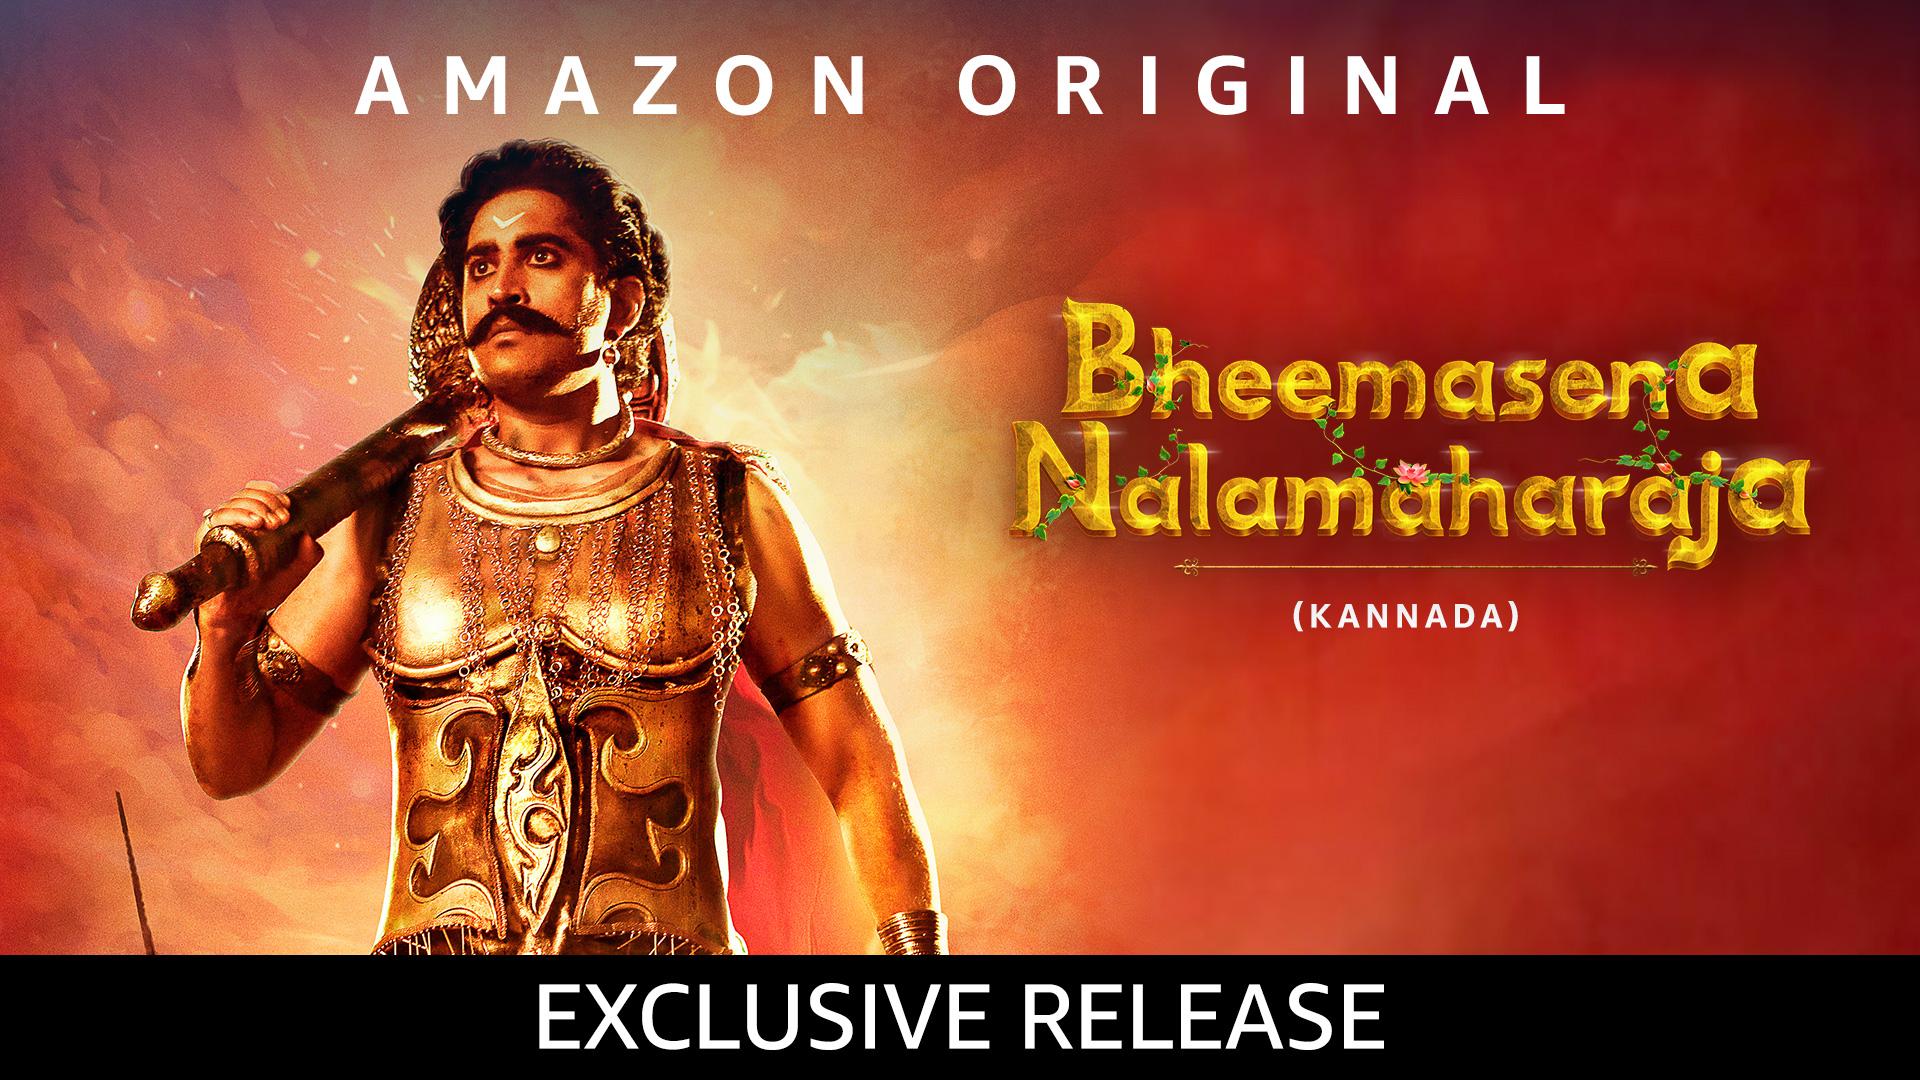 Bheemasena Nalamaharaja